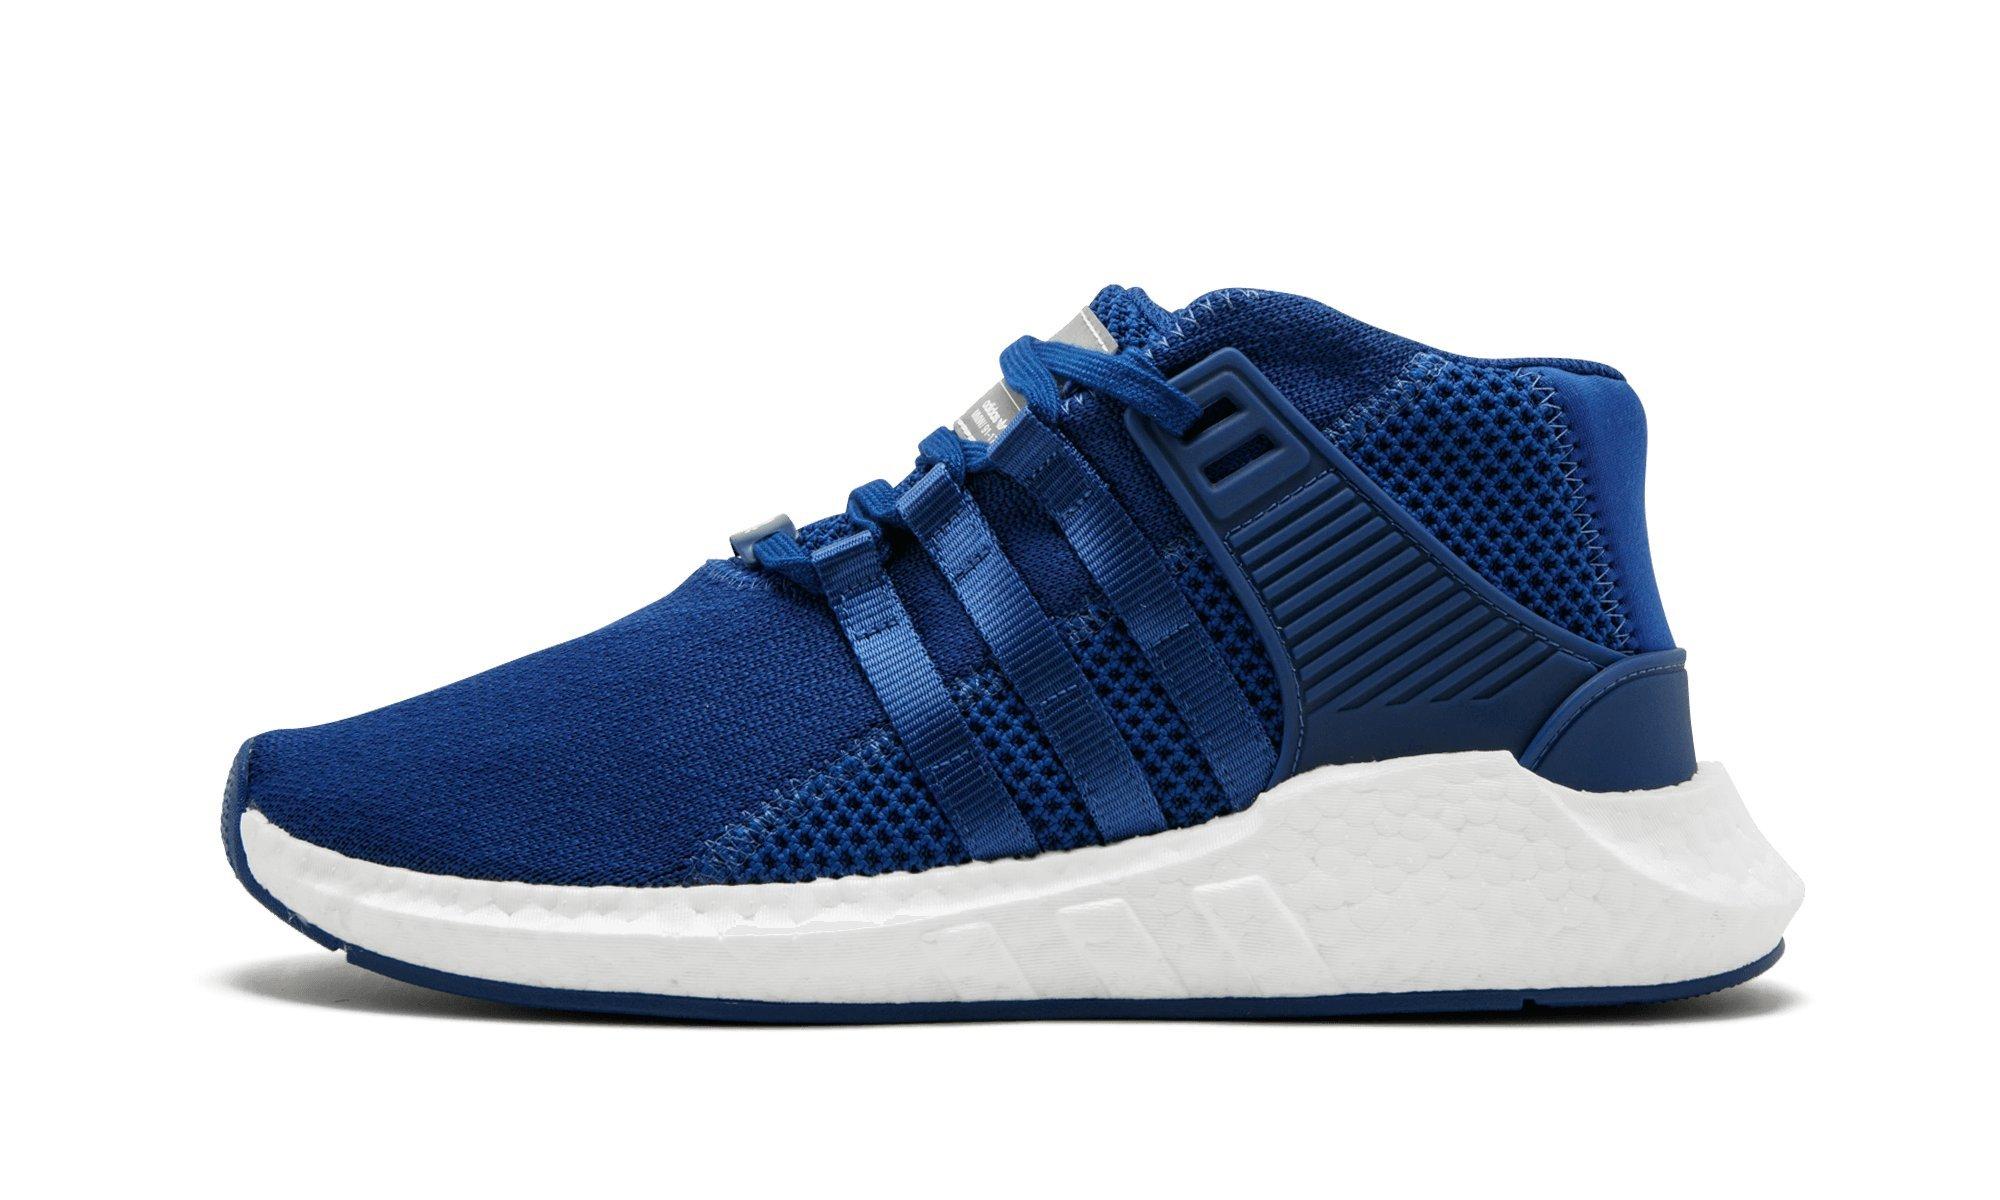 uk availability 02f61 46ac9 adidas x Mastermind Mens EQT Support Future 9317 Blue CQ1825